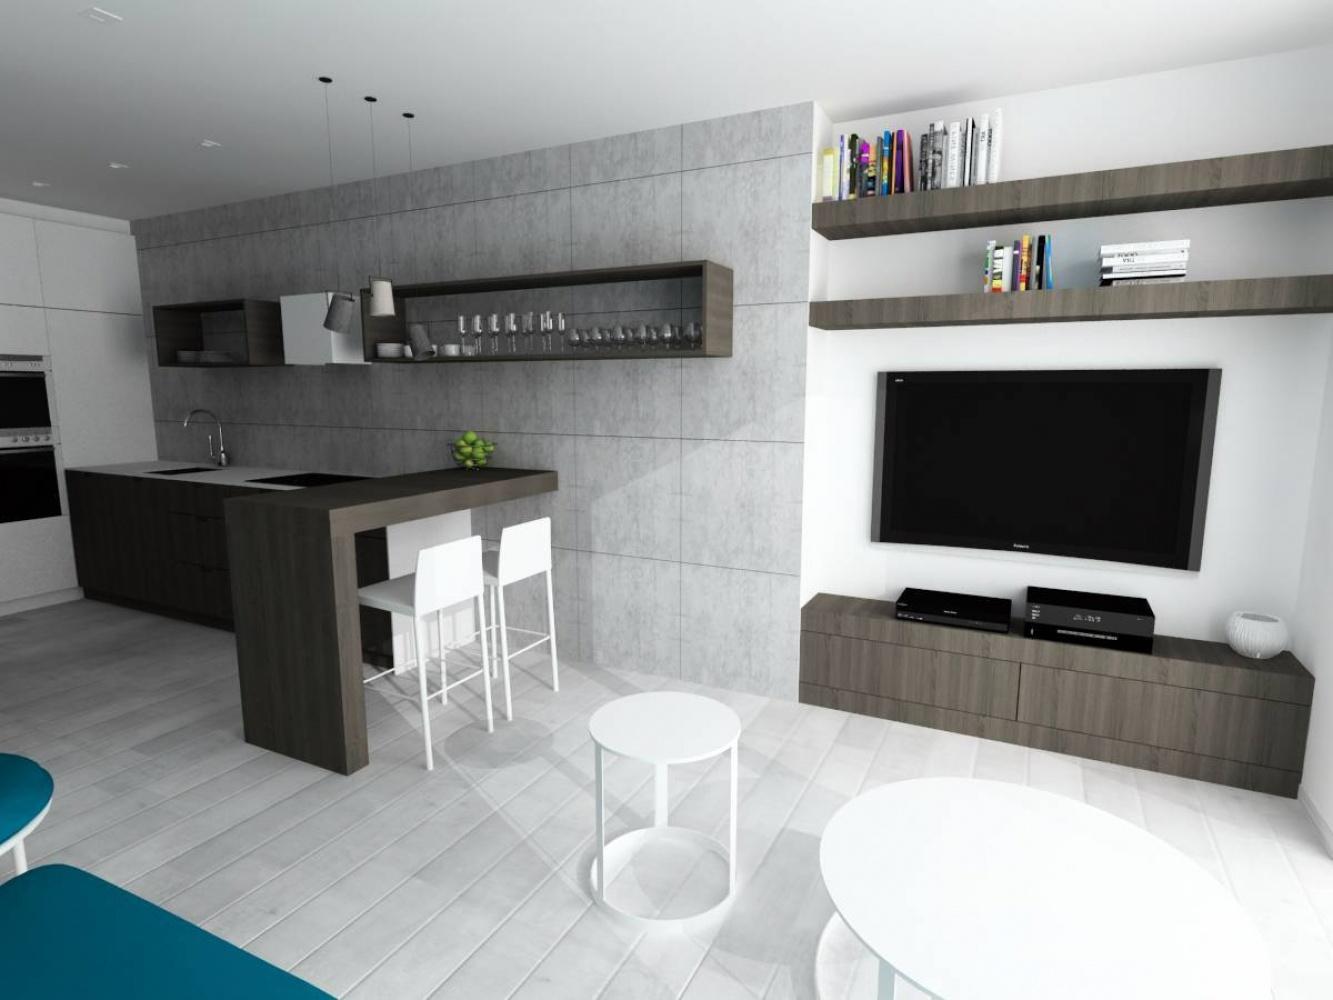 Půdní byt 2+kk, plocha 56 m², ulice Svatoslavova, Praha 4 - Nusle | 2